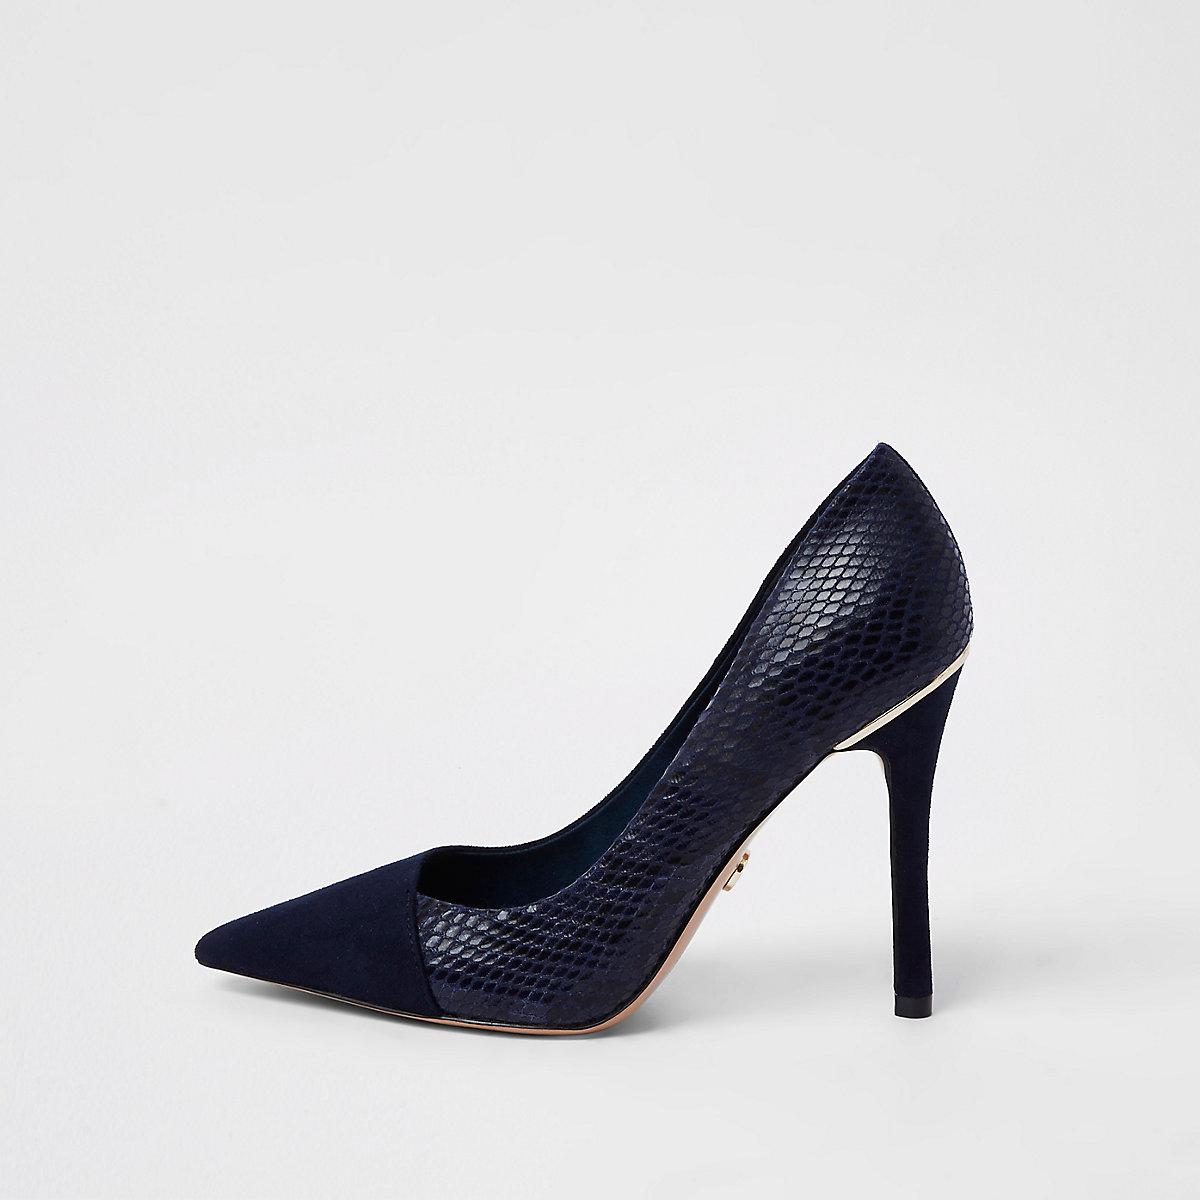 Navy croc wrap around court shoes